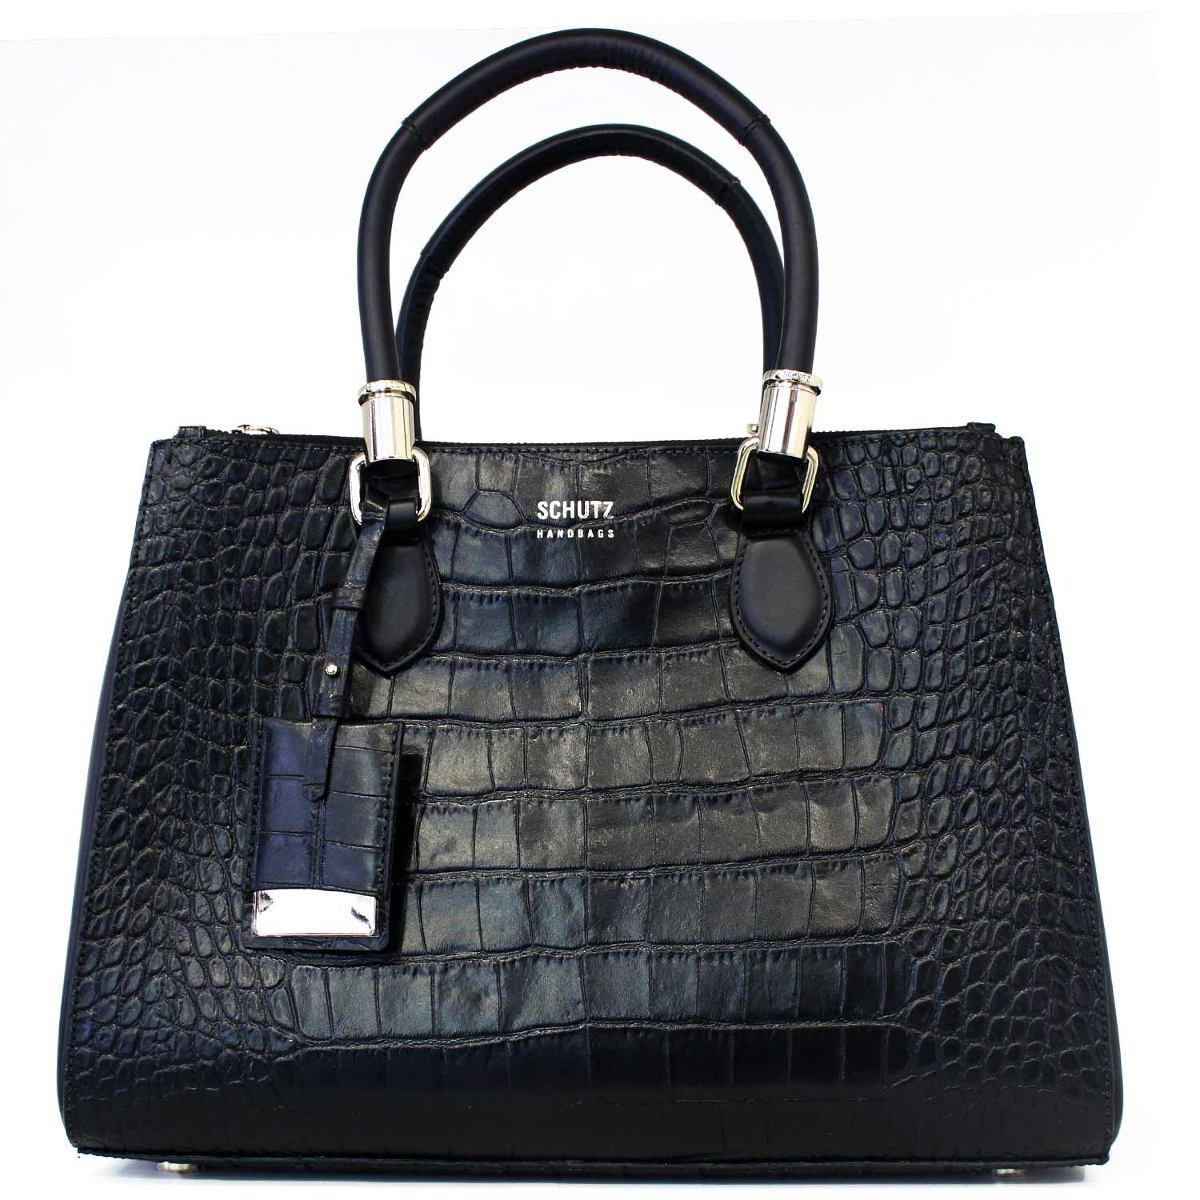 66f572fd1 Bolsa Schutz Lorena Grande Croco Preto-preto - R$ 990,00 em Mercado ...